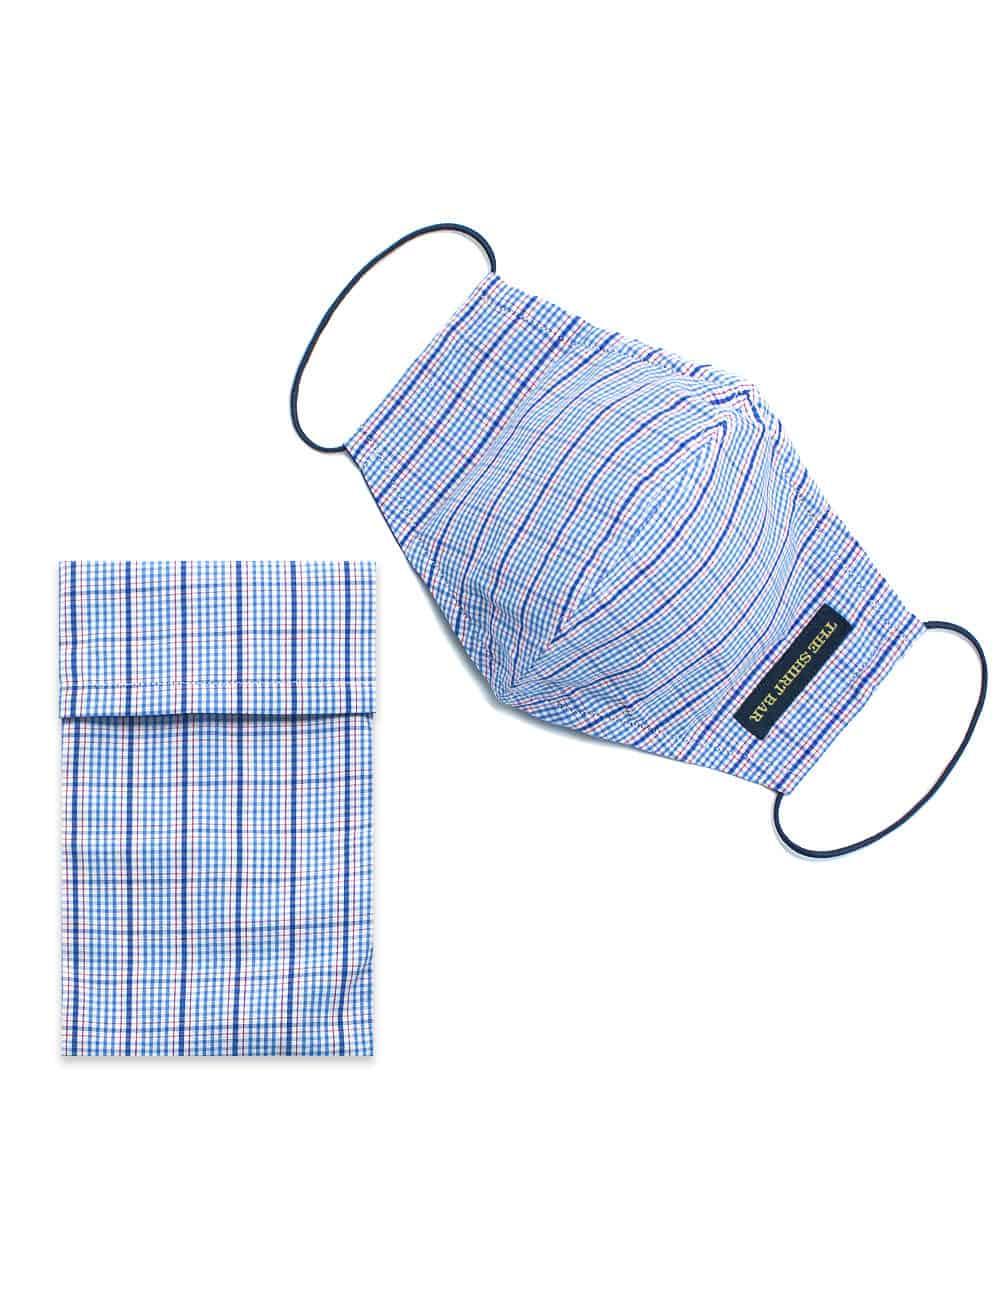 Blue Checks Reusable Mask with Pouch FM24.1